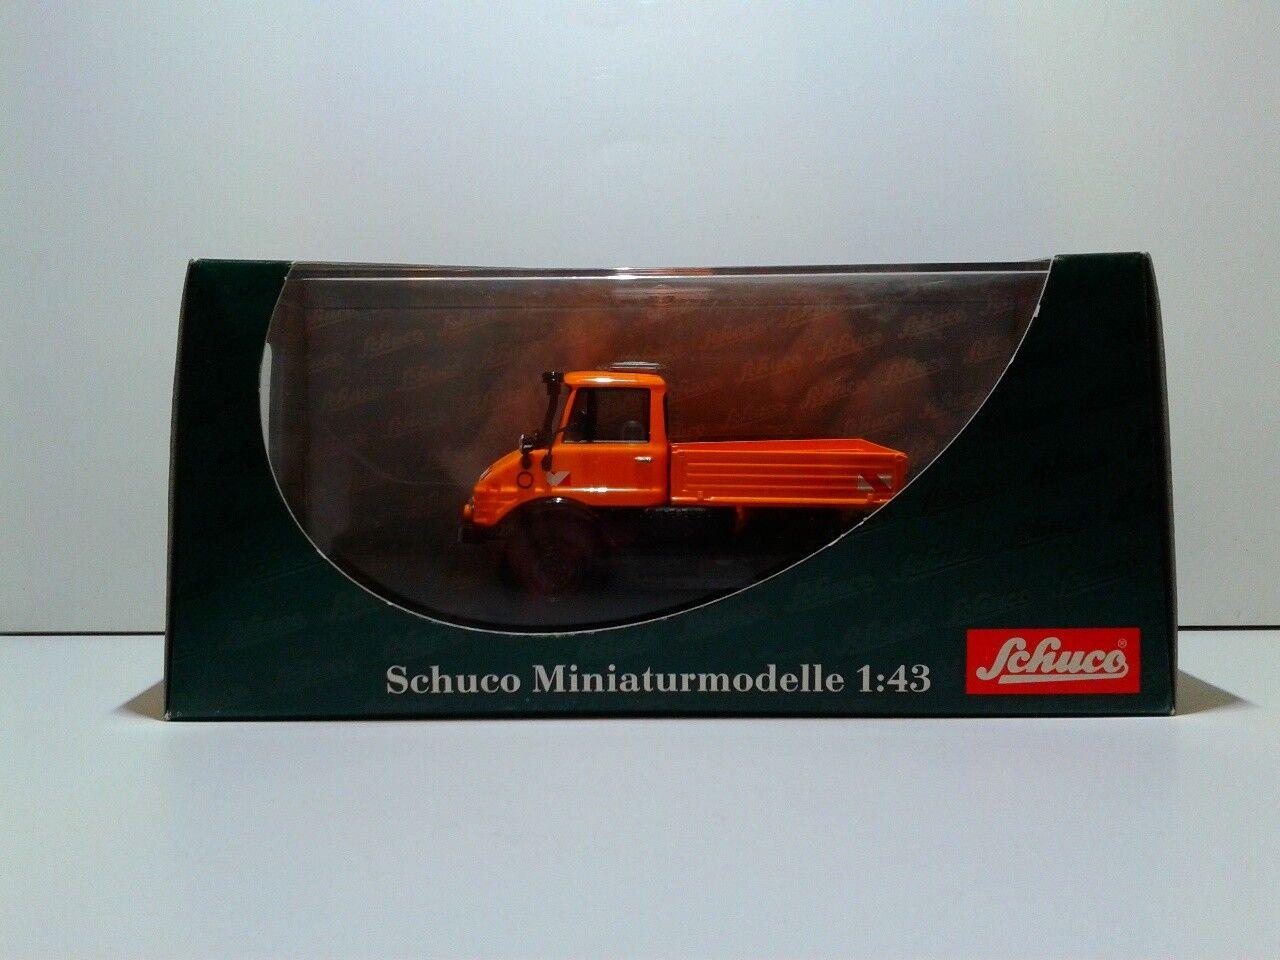 moda Schuco 03151 Mercedes Benz Unimog 406 Strassenmeisterei 1 1 1 43 OVP MIB  los clientes primero